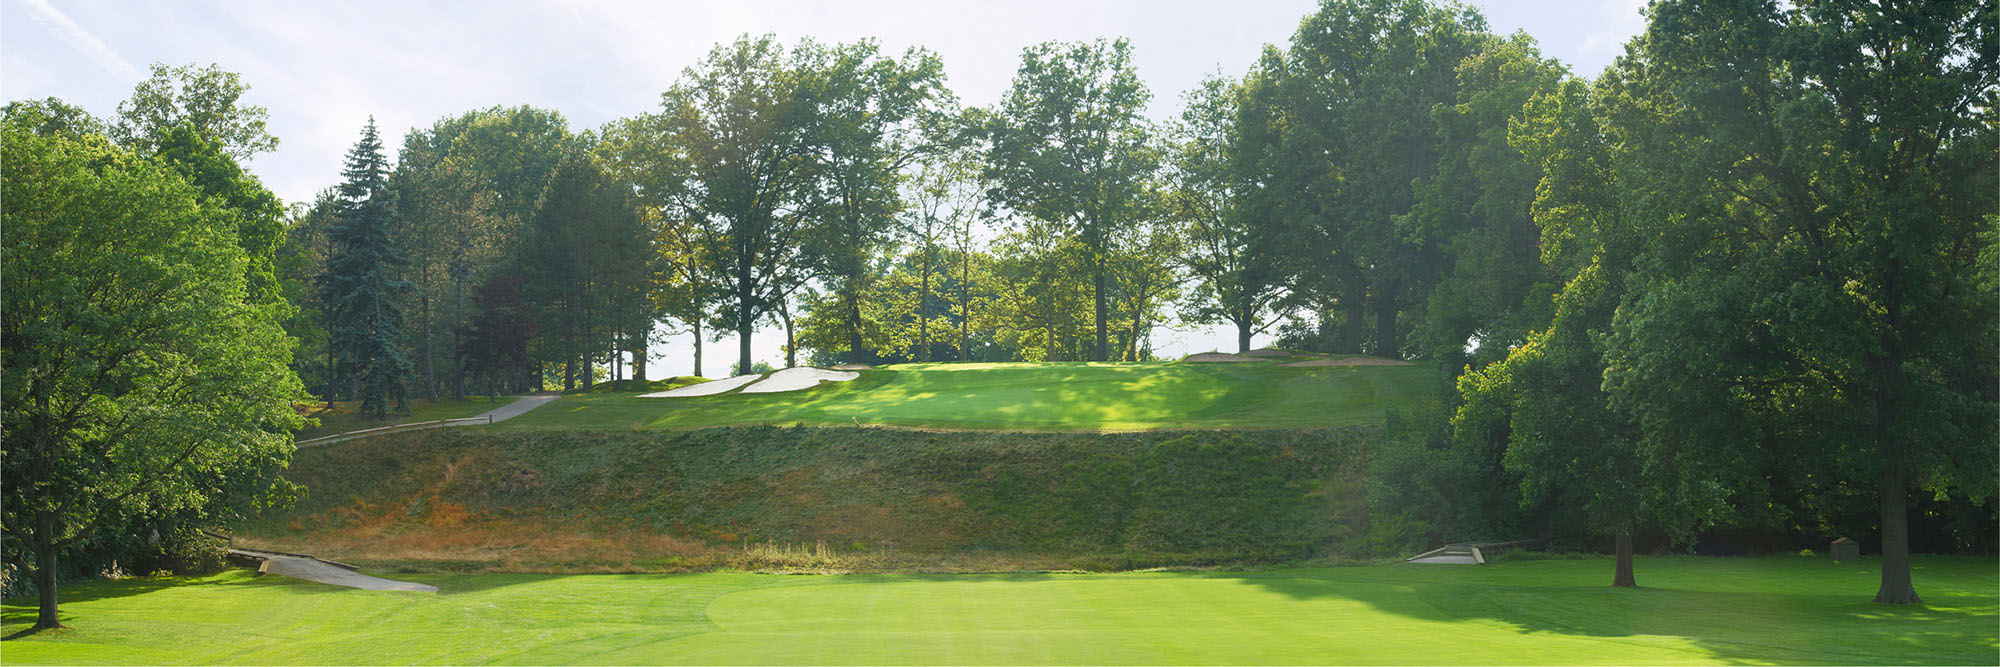 Golf Course Image - Canterbury No. 15